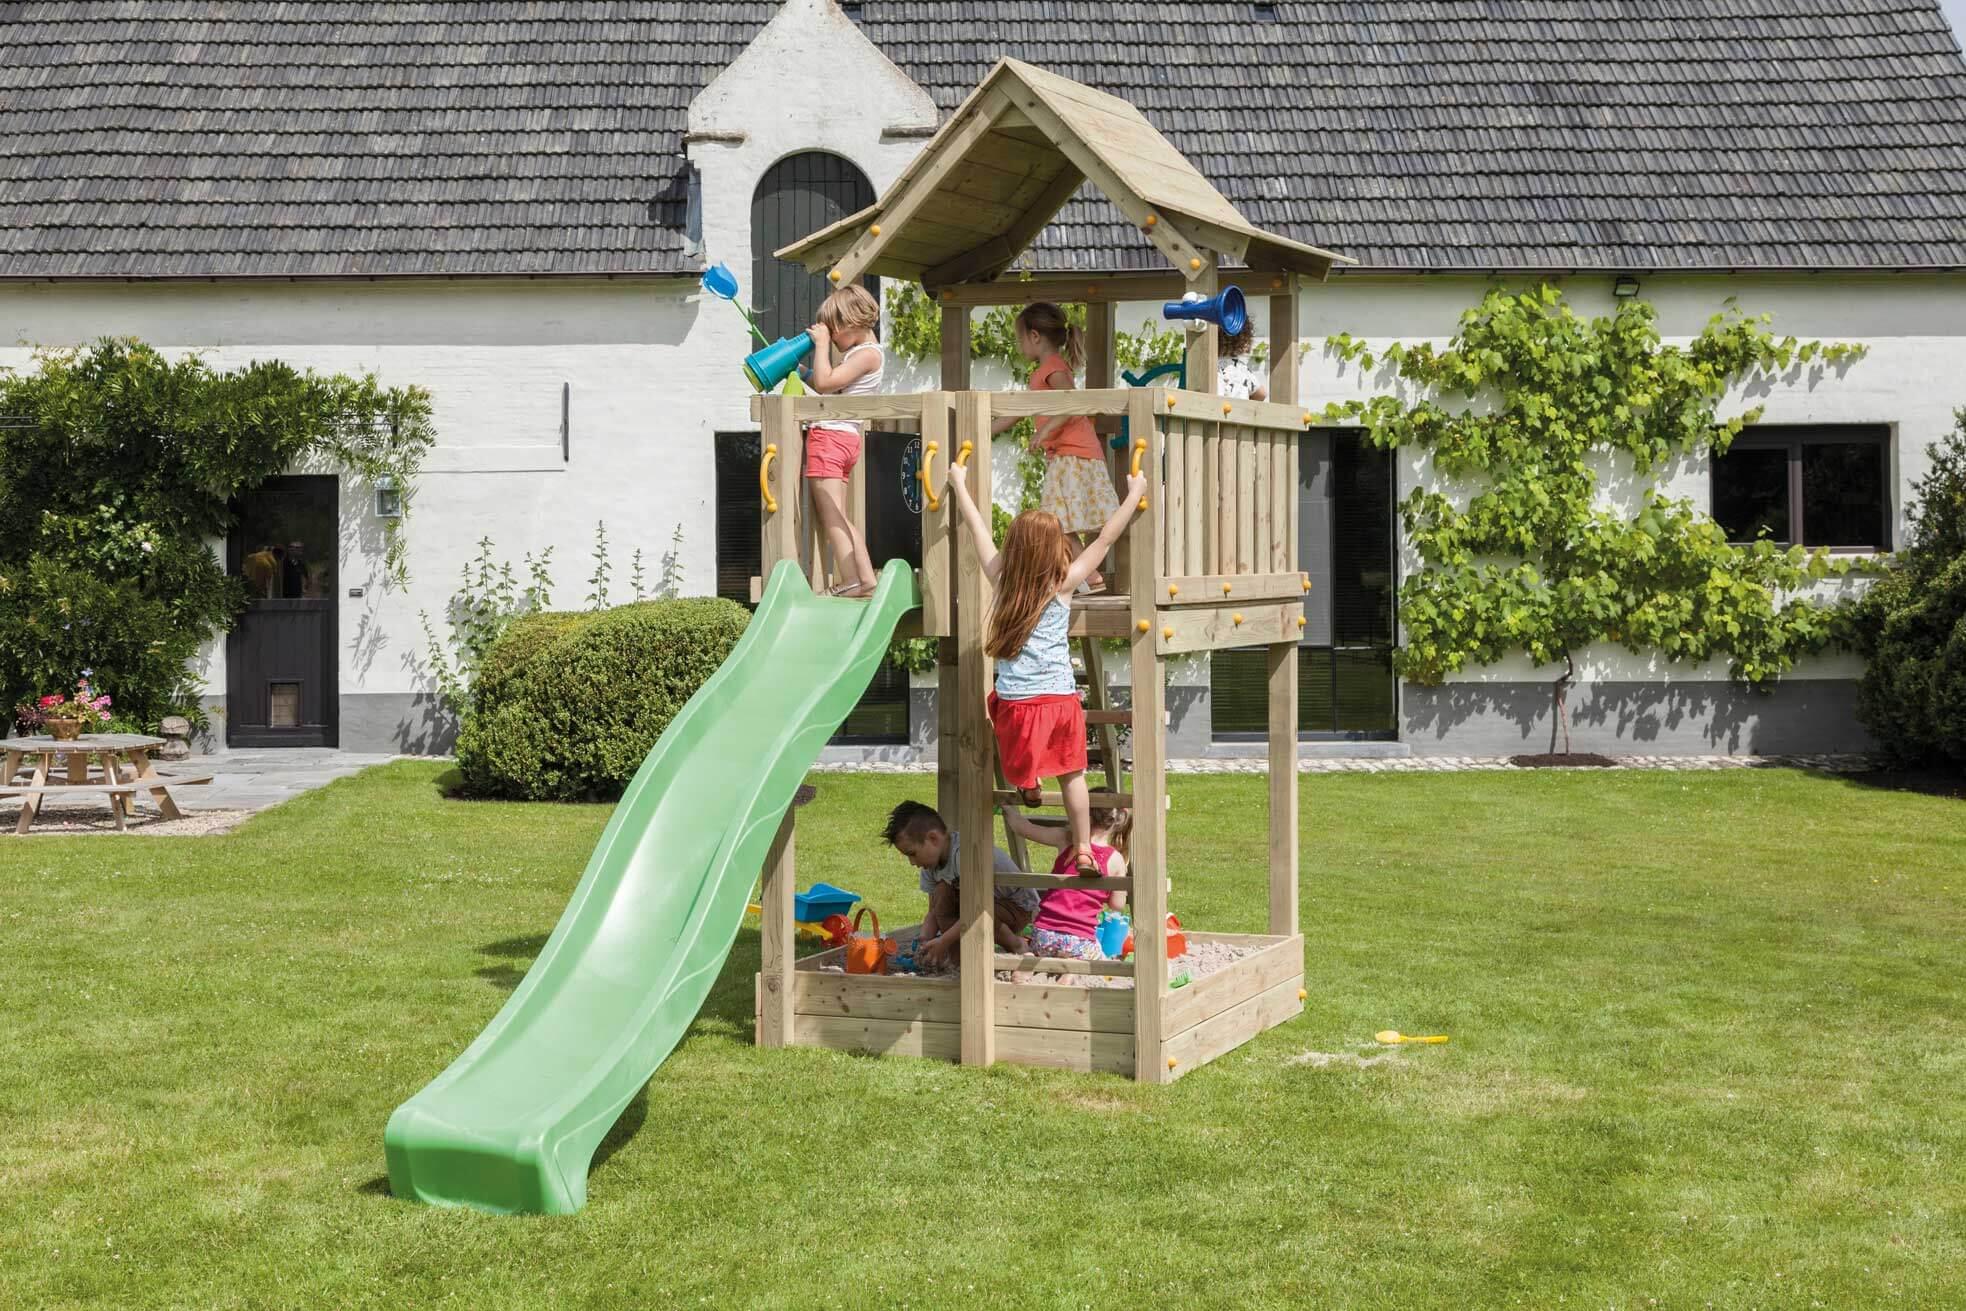 Full Size of Spielturm Garten Fr Den Bauhaus Fenster Kinderspielturm Wohnzimmer Spielturm Bauhaus